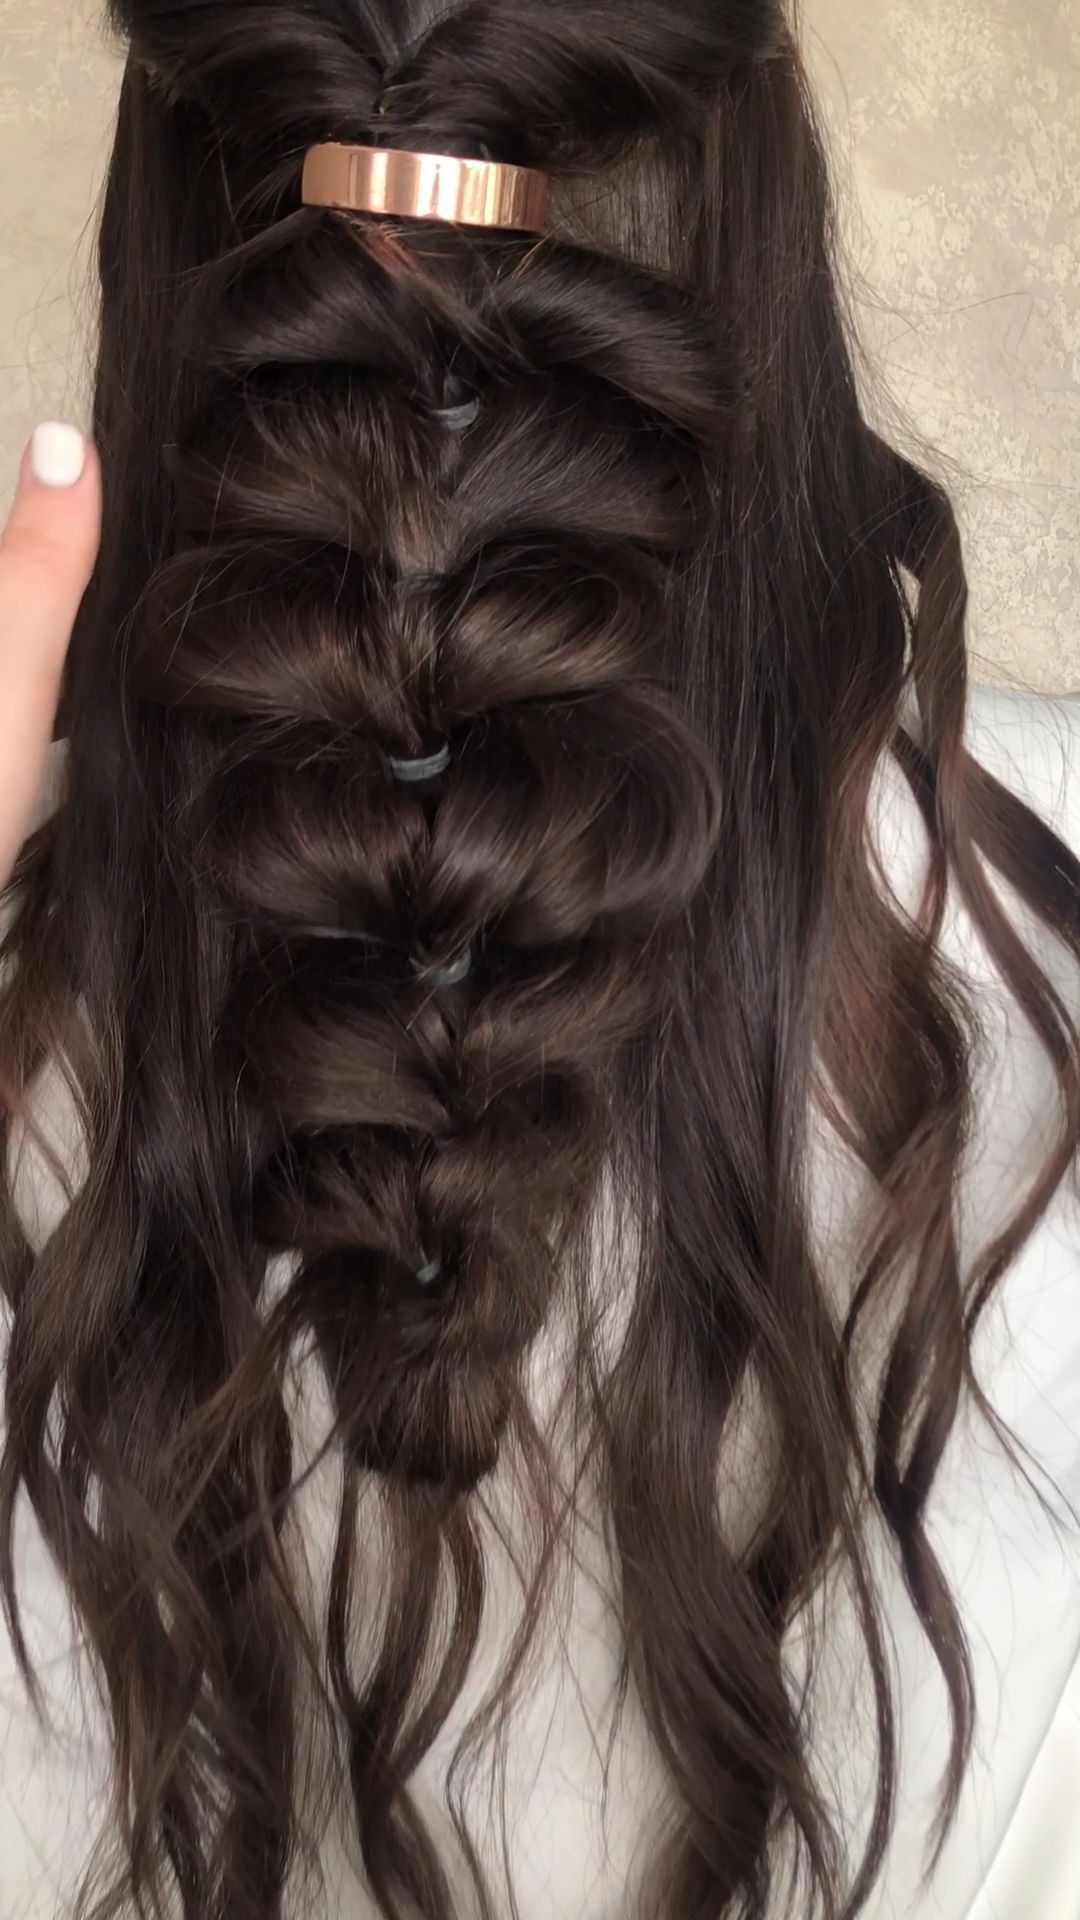 Popular Braid Tutorials Easy Hairstyle Video Hair Videos Hair Styles